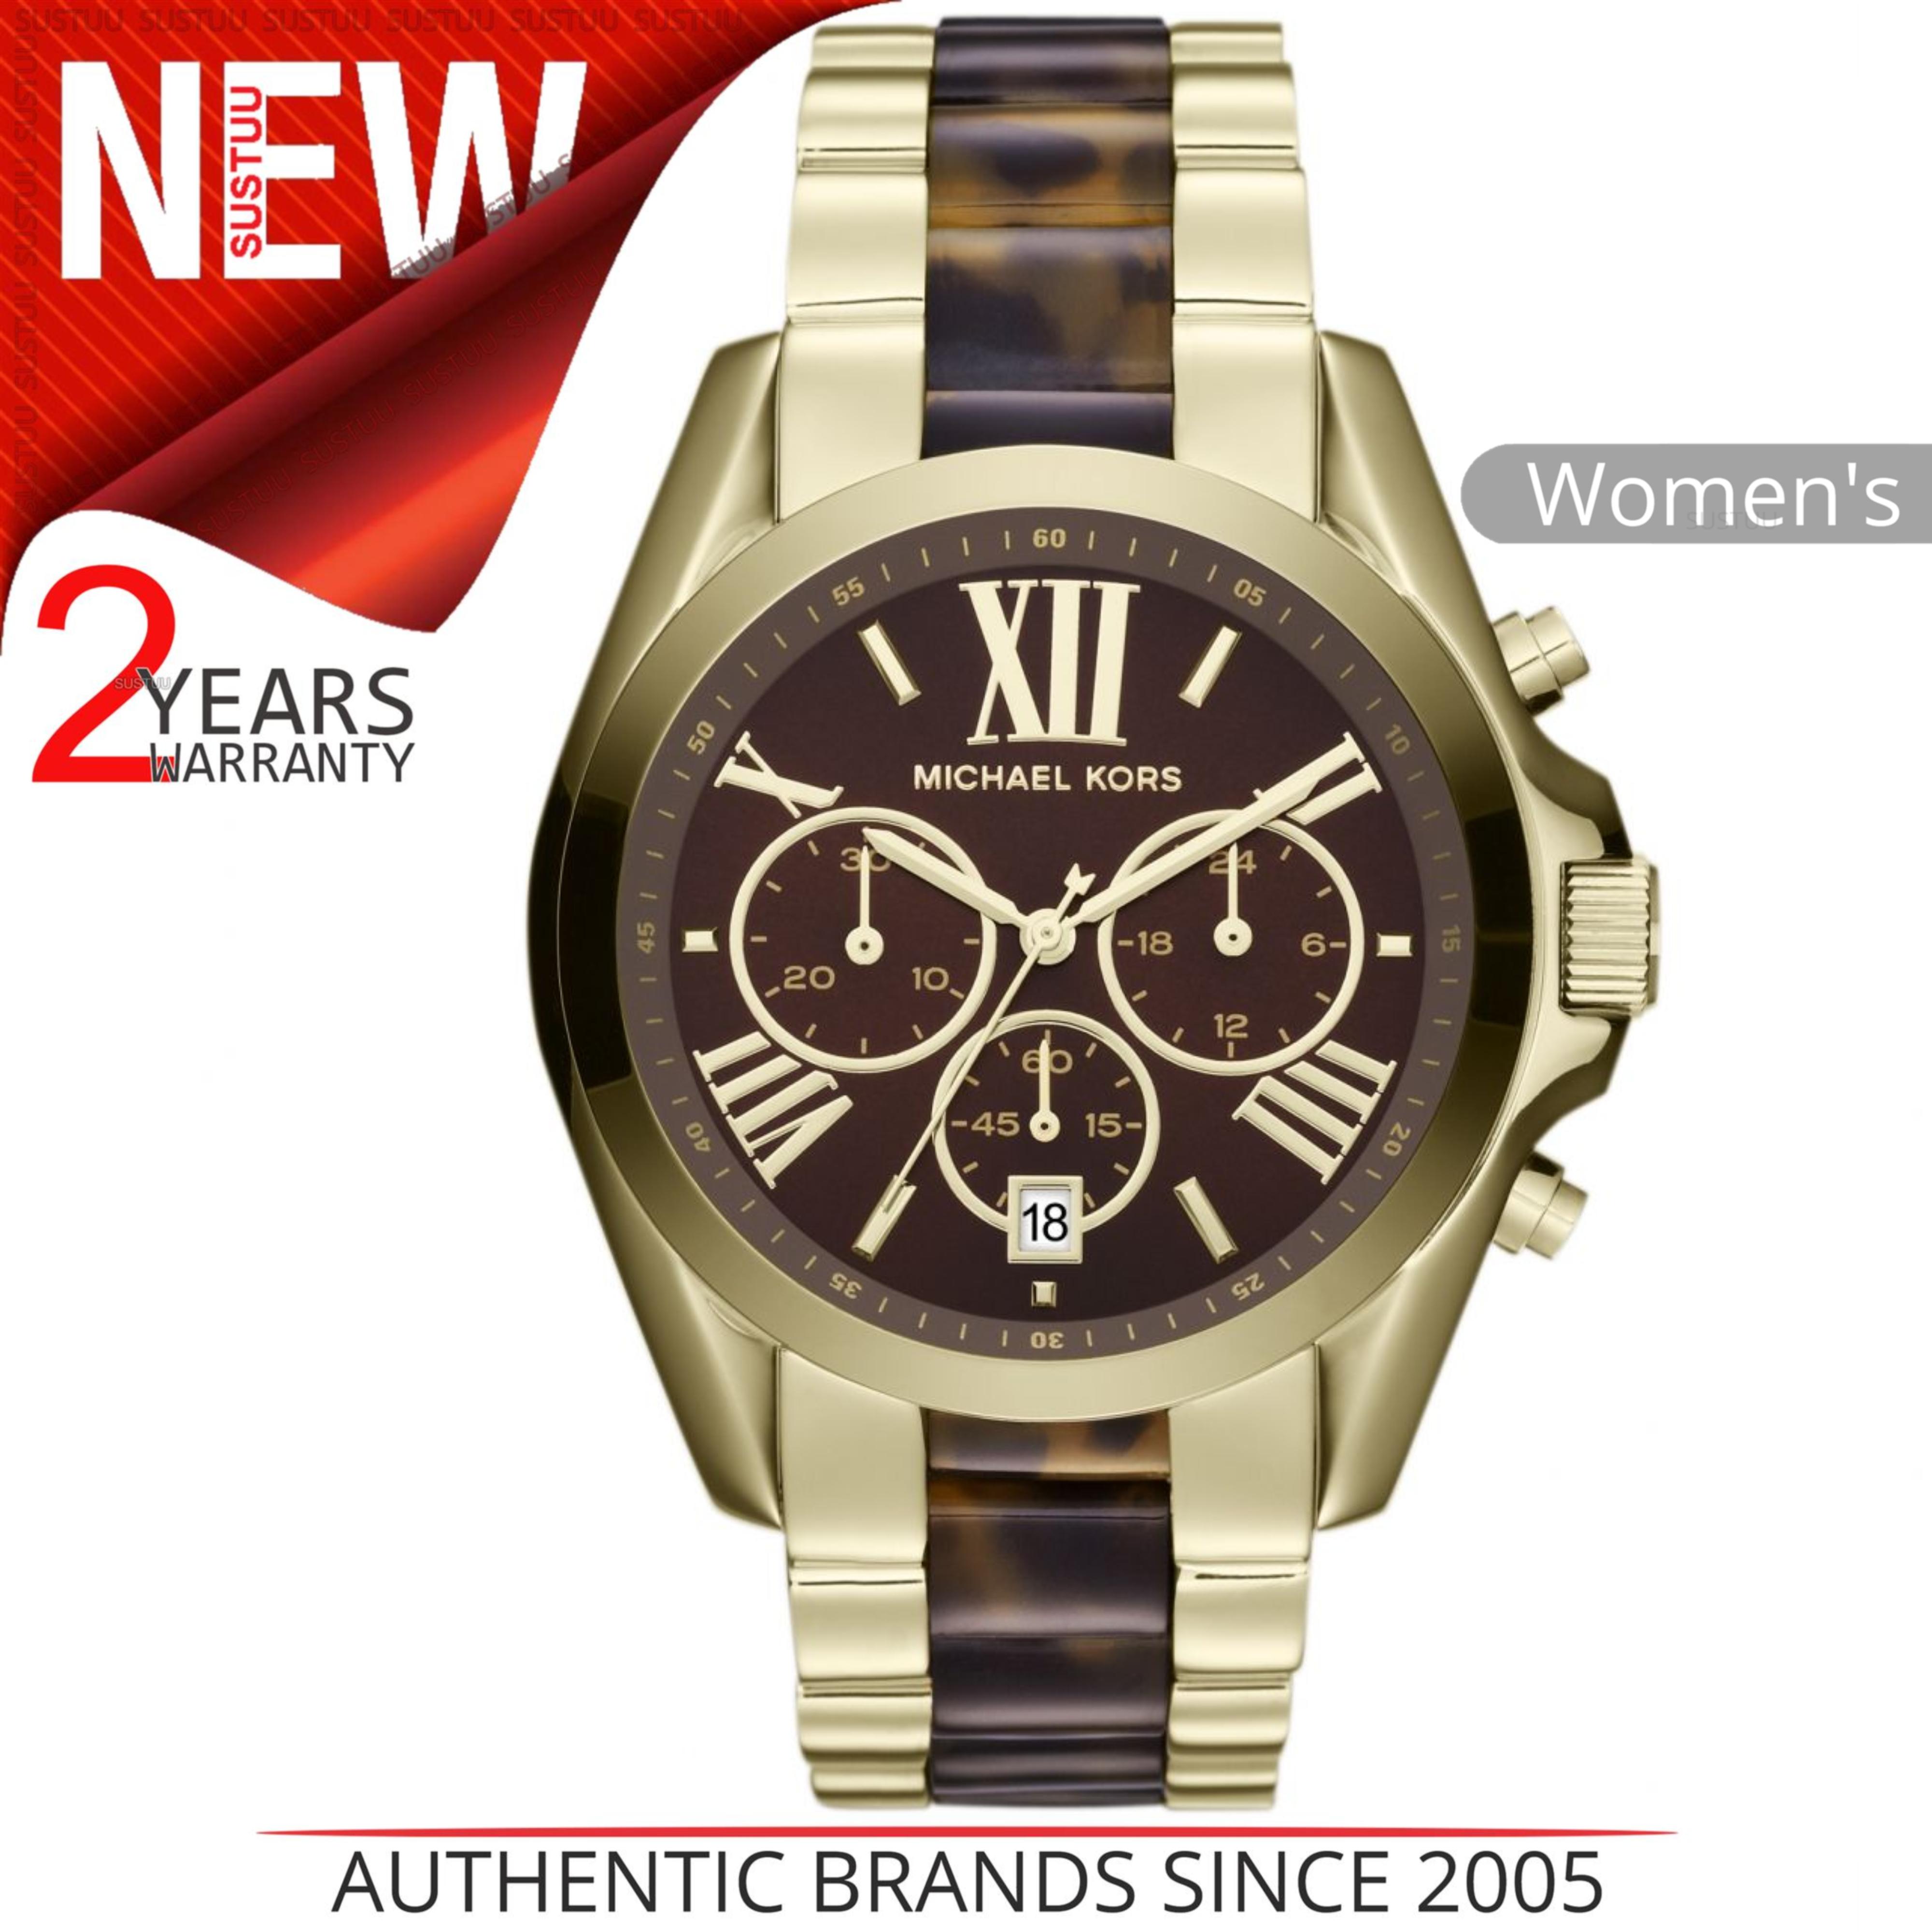 ce7160f935c56 Details about Michael Kors Bradshaw Women s Watch│Chrono Dial Tortoise  Shell Bracelet│MK5696│